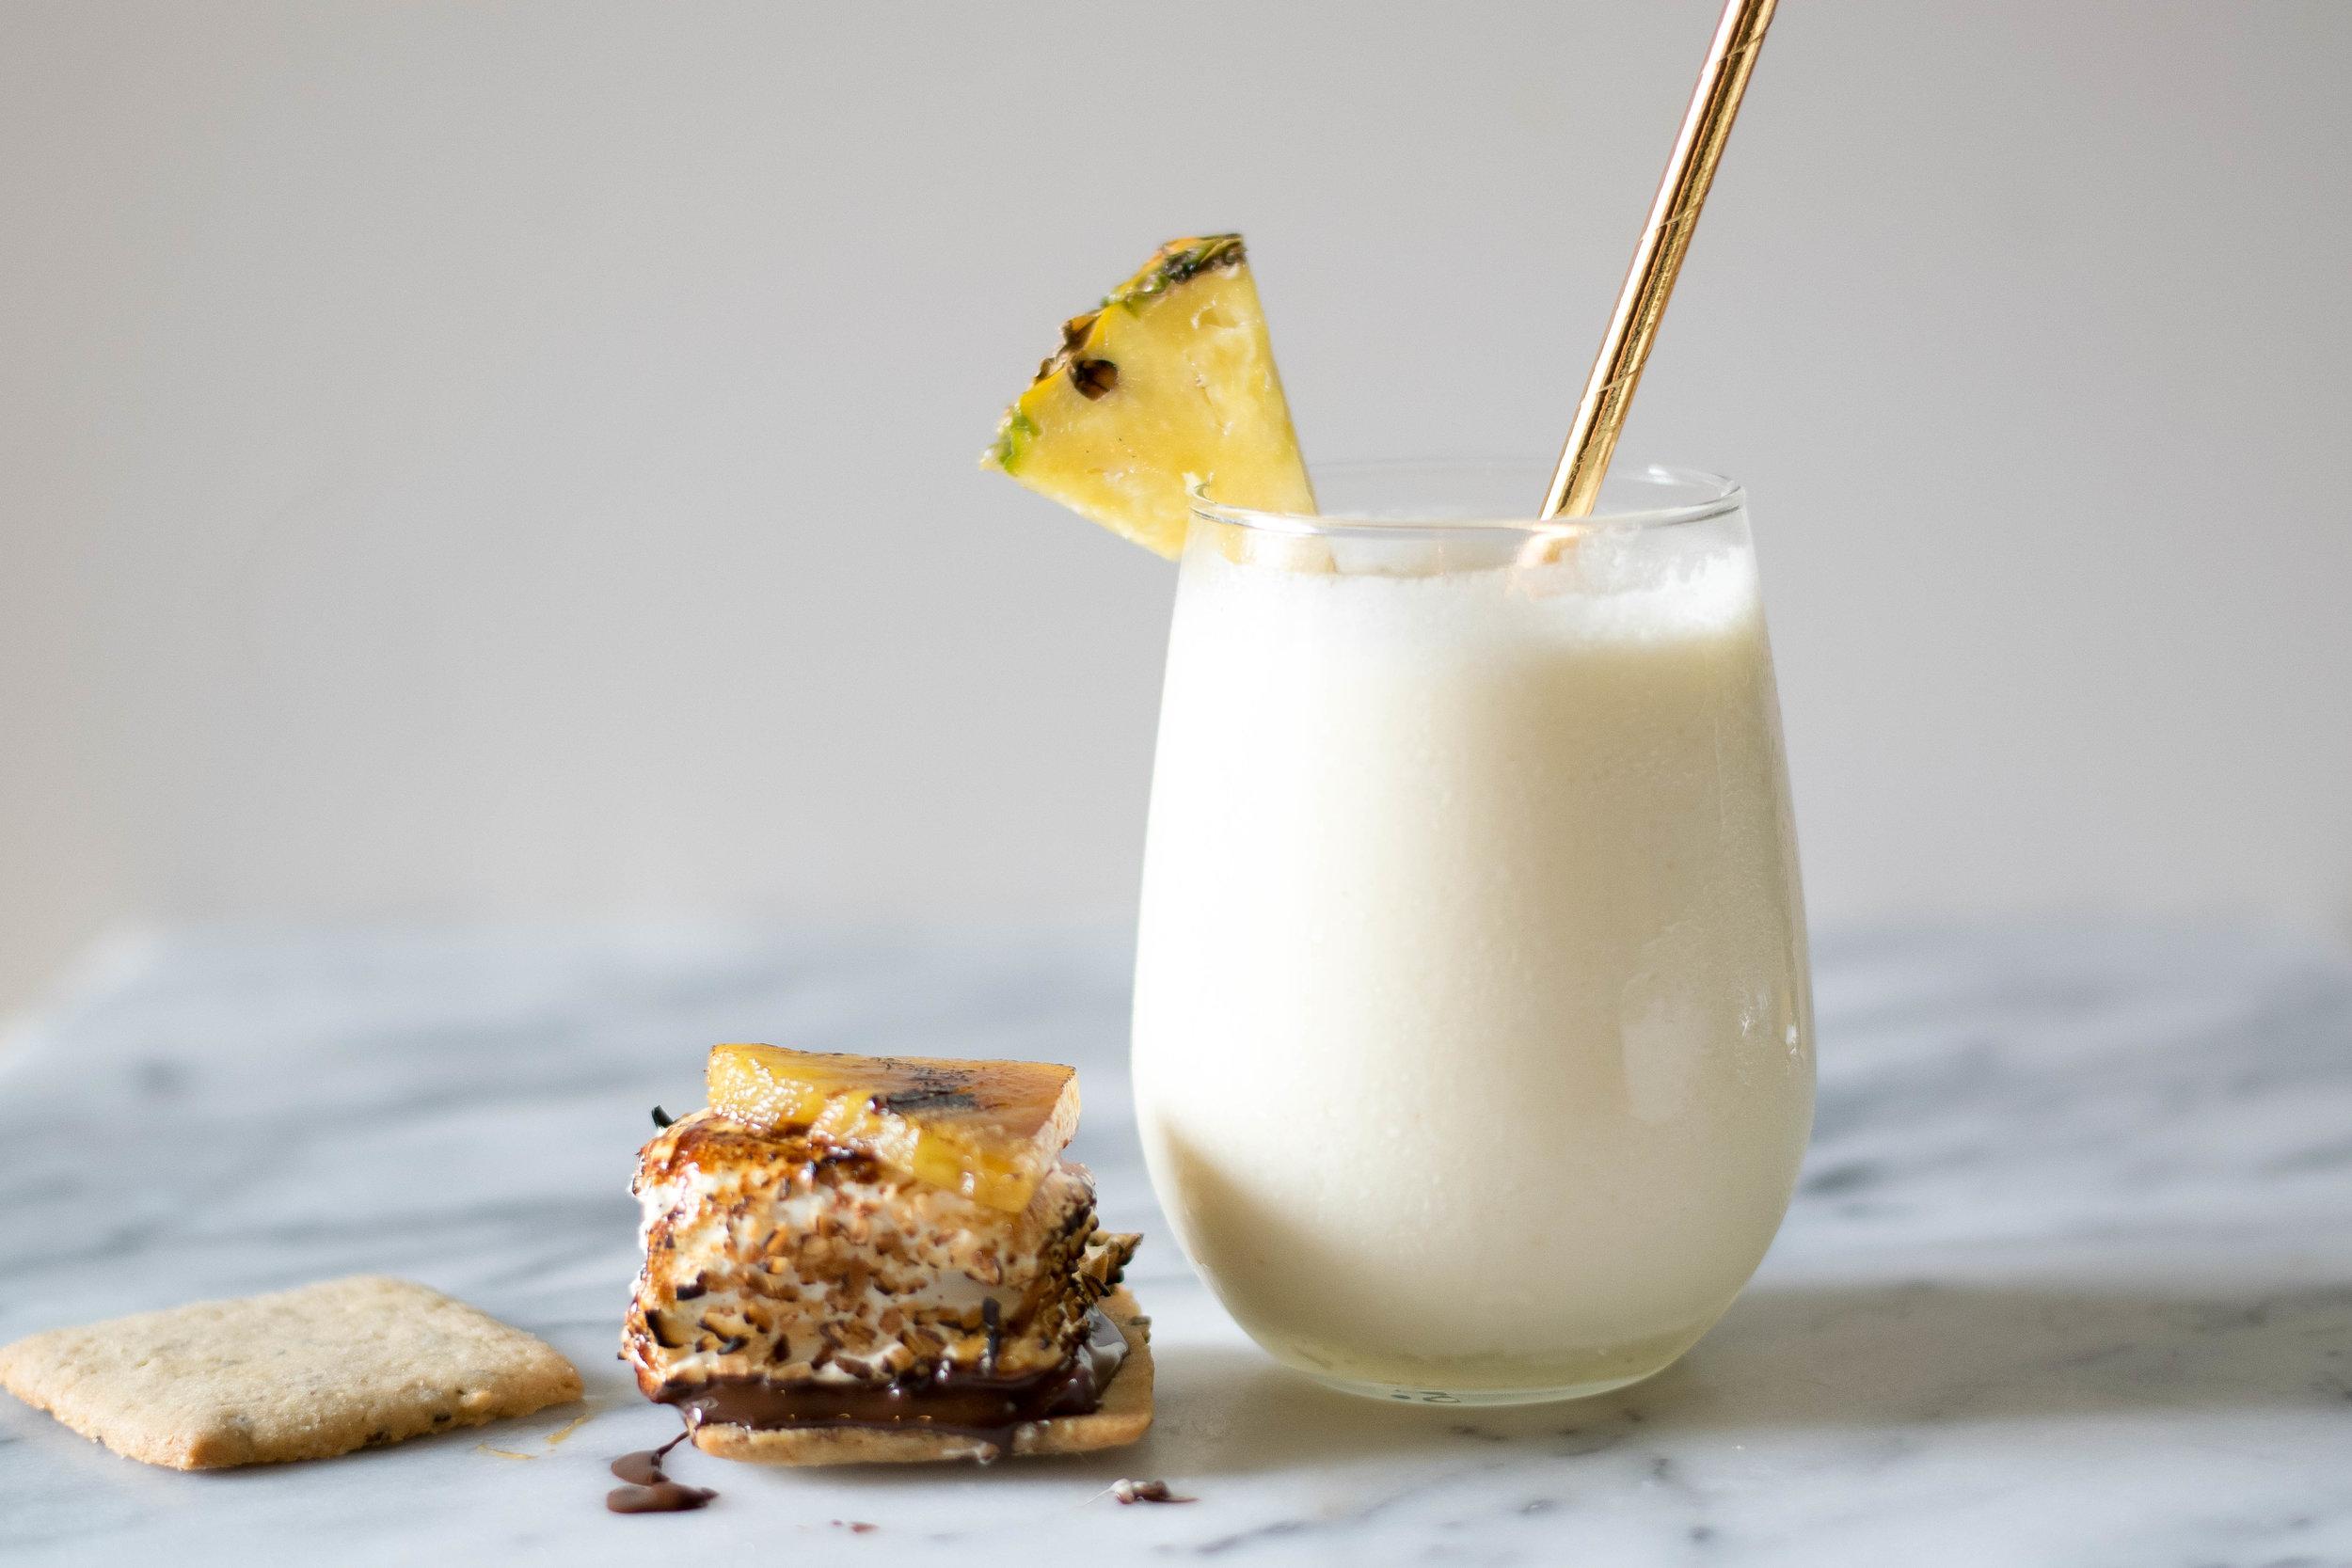 Cocktail-Inspired: Piña Colada x S'mores! | All Purpose Flour Child